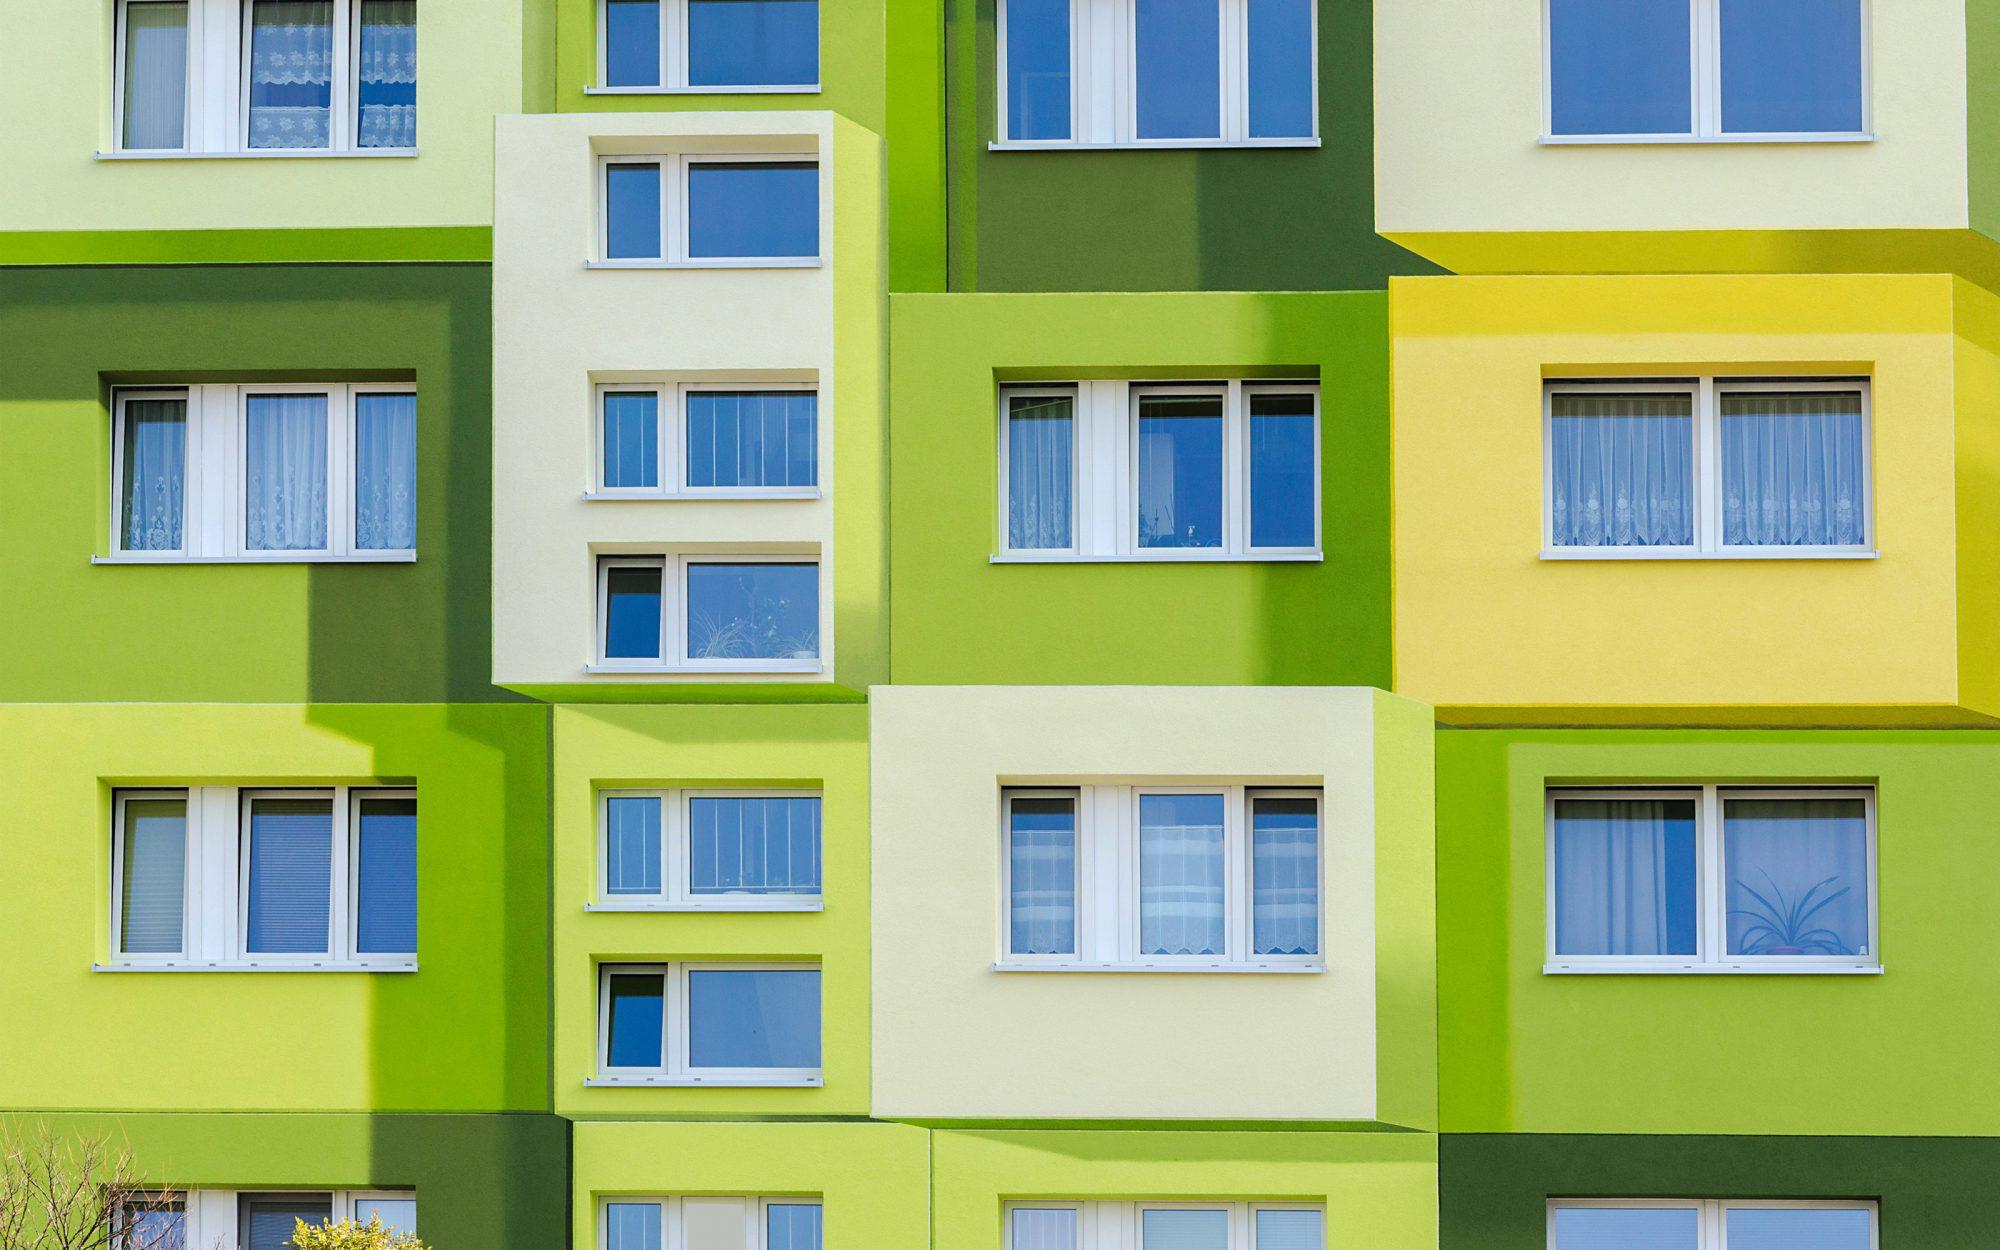 GRACO-Senftenberg-Architektur-Design-Fassadenmalerei